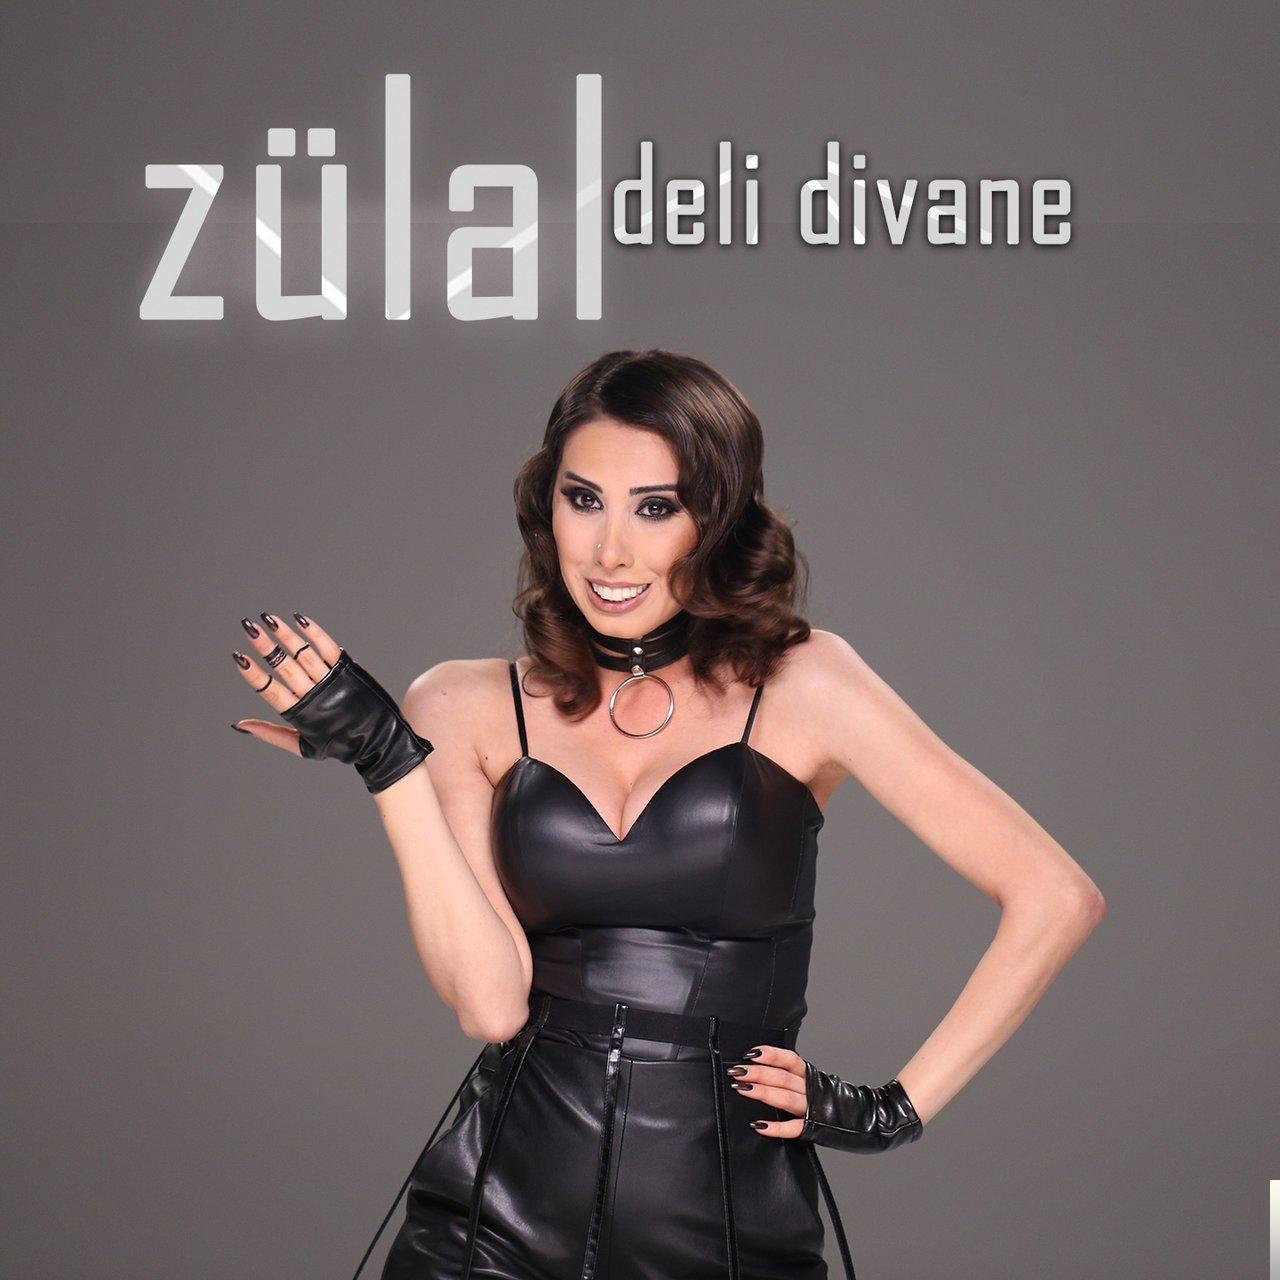 Zulal Deli Divane Mp3 Indir Deli Divane Muzik Indir Dinle